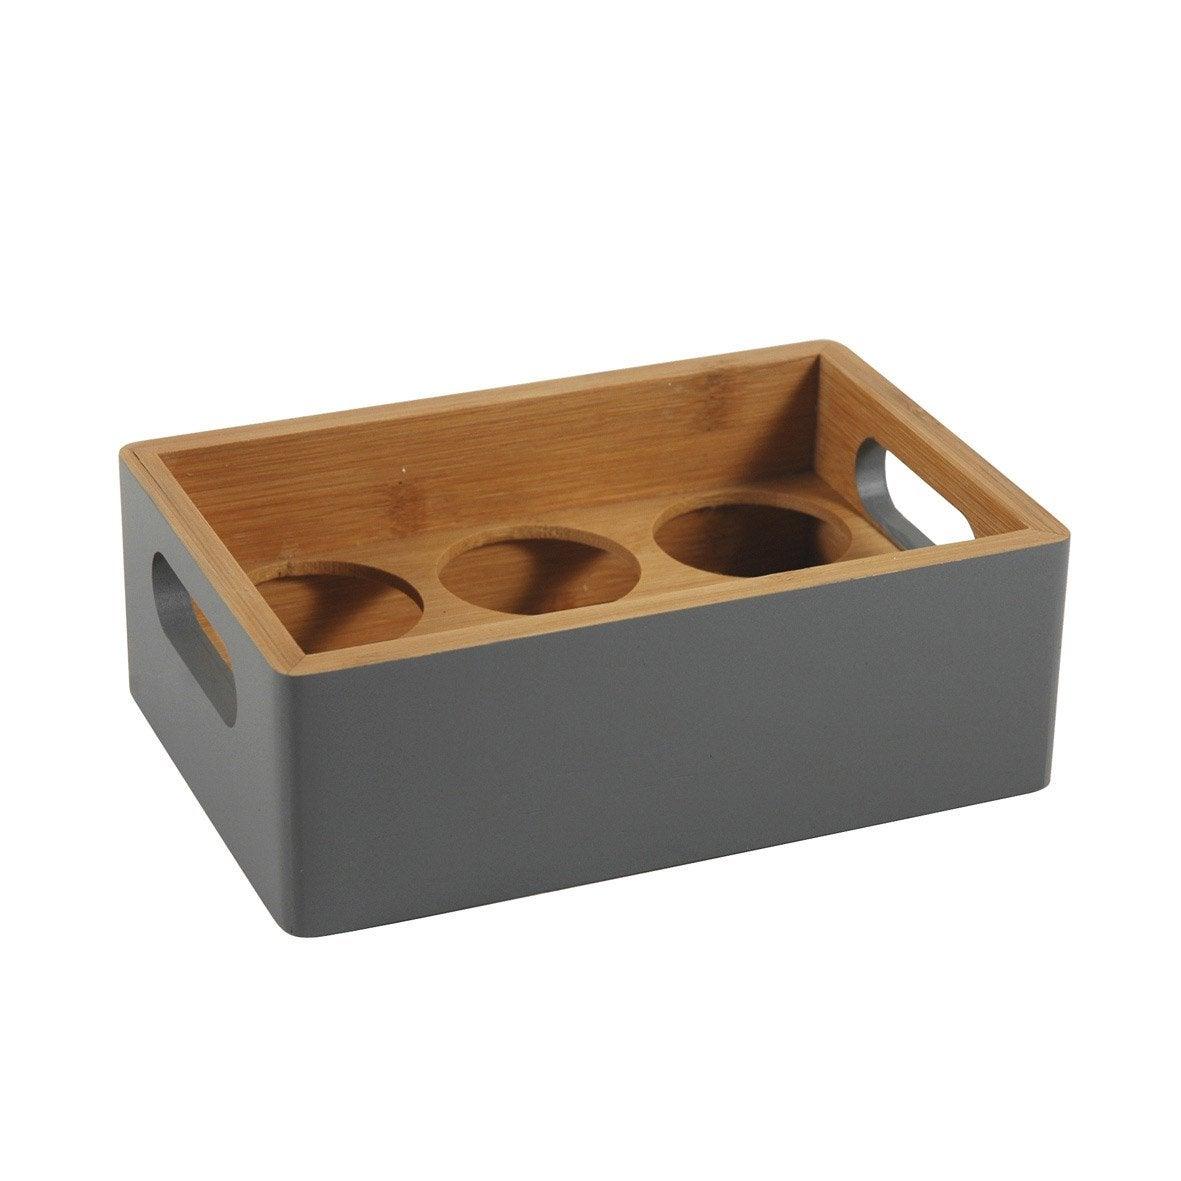 porte pices bambou laqu gris gris n 1 leroy merlin. Black Bedroom Furniture Sets. Home Design Ideas